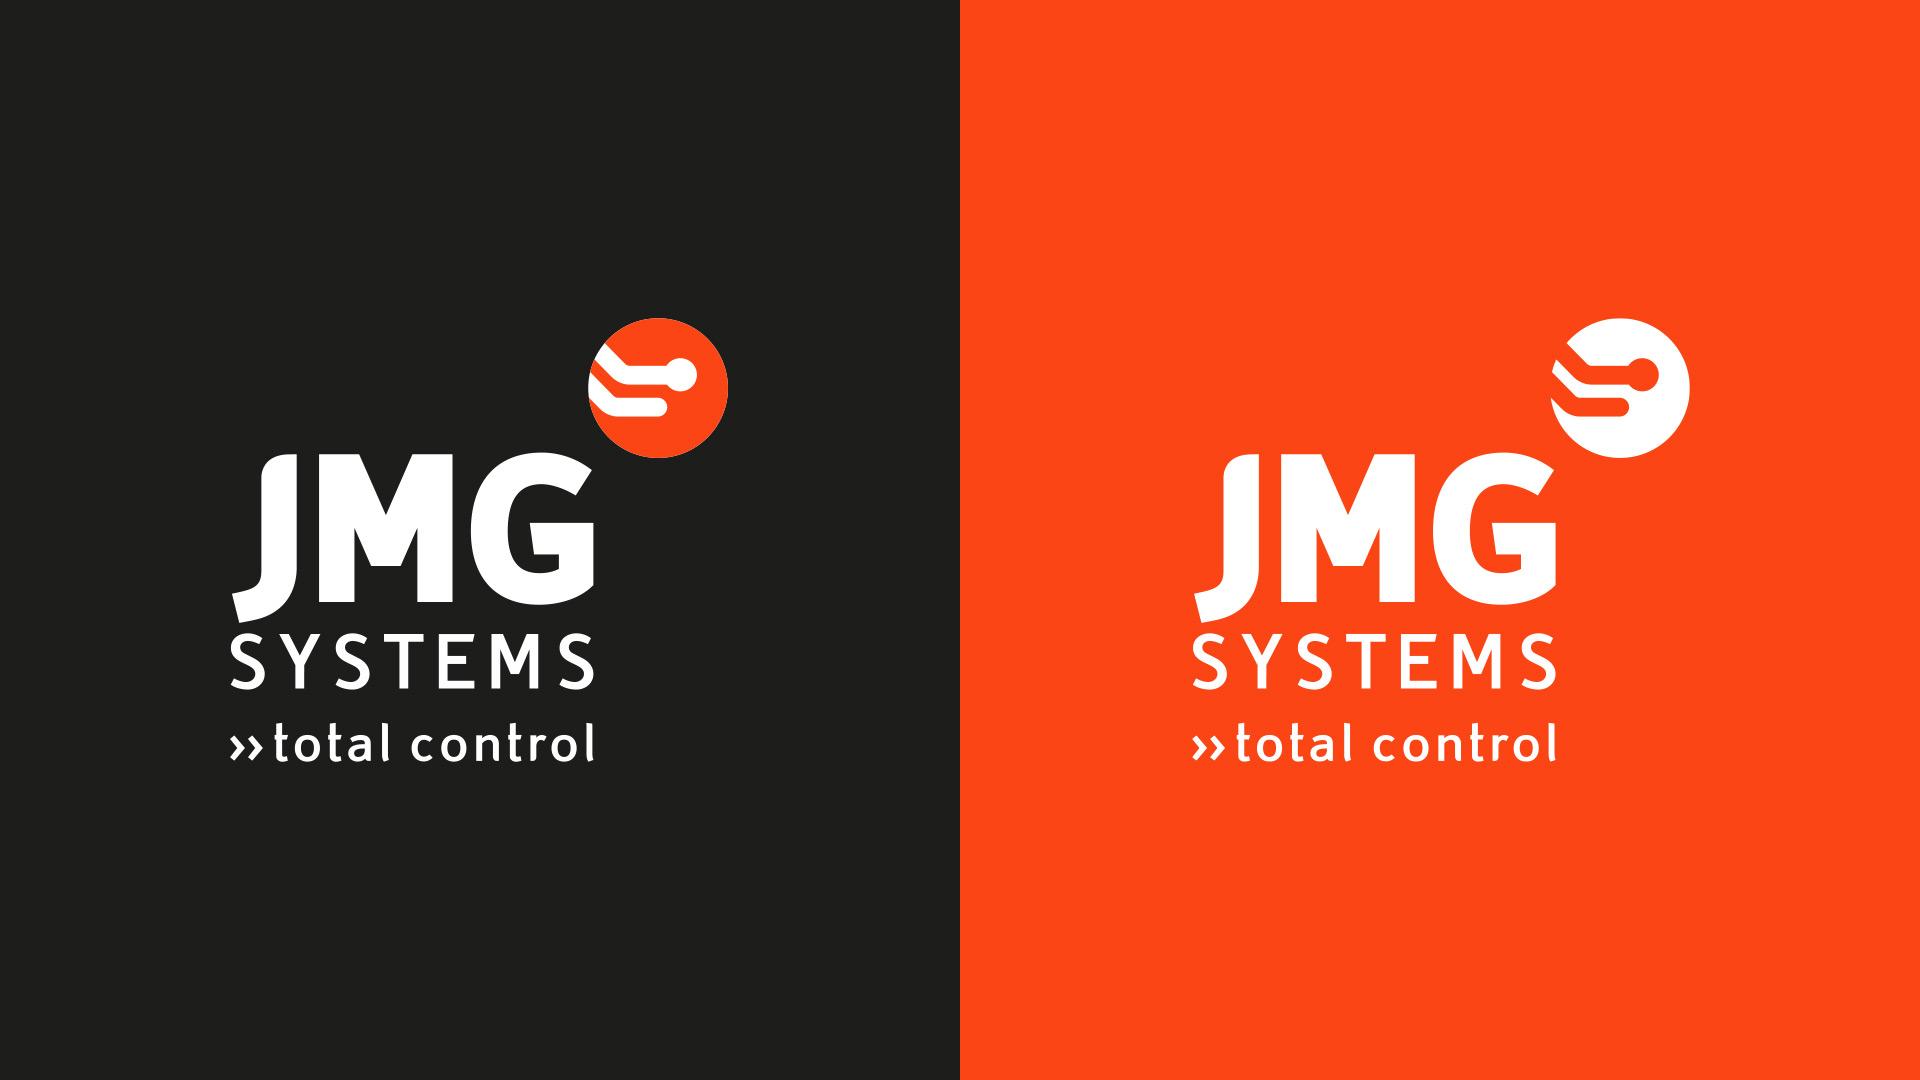 JMG Systems Corporate Identity